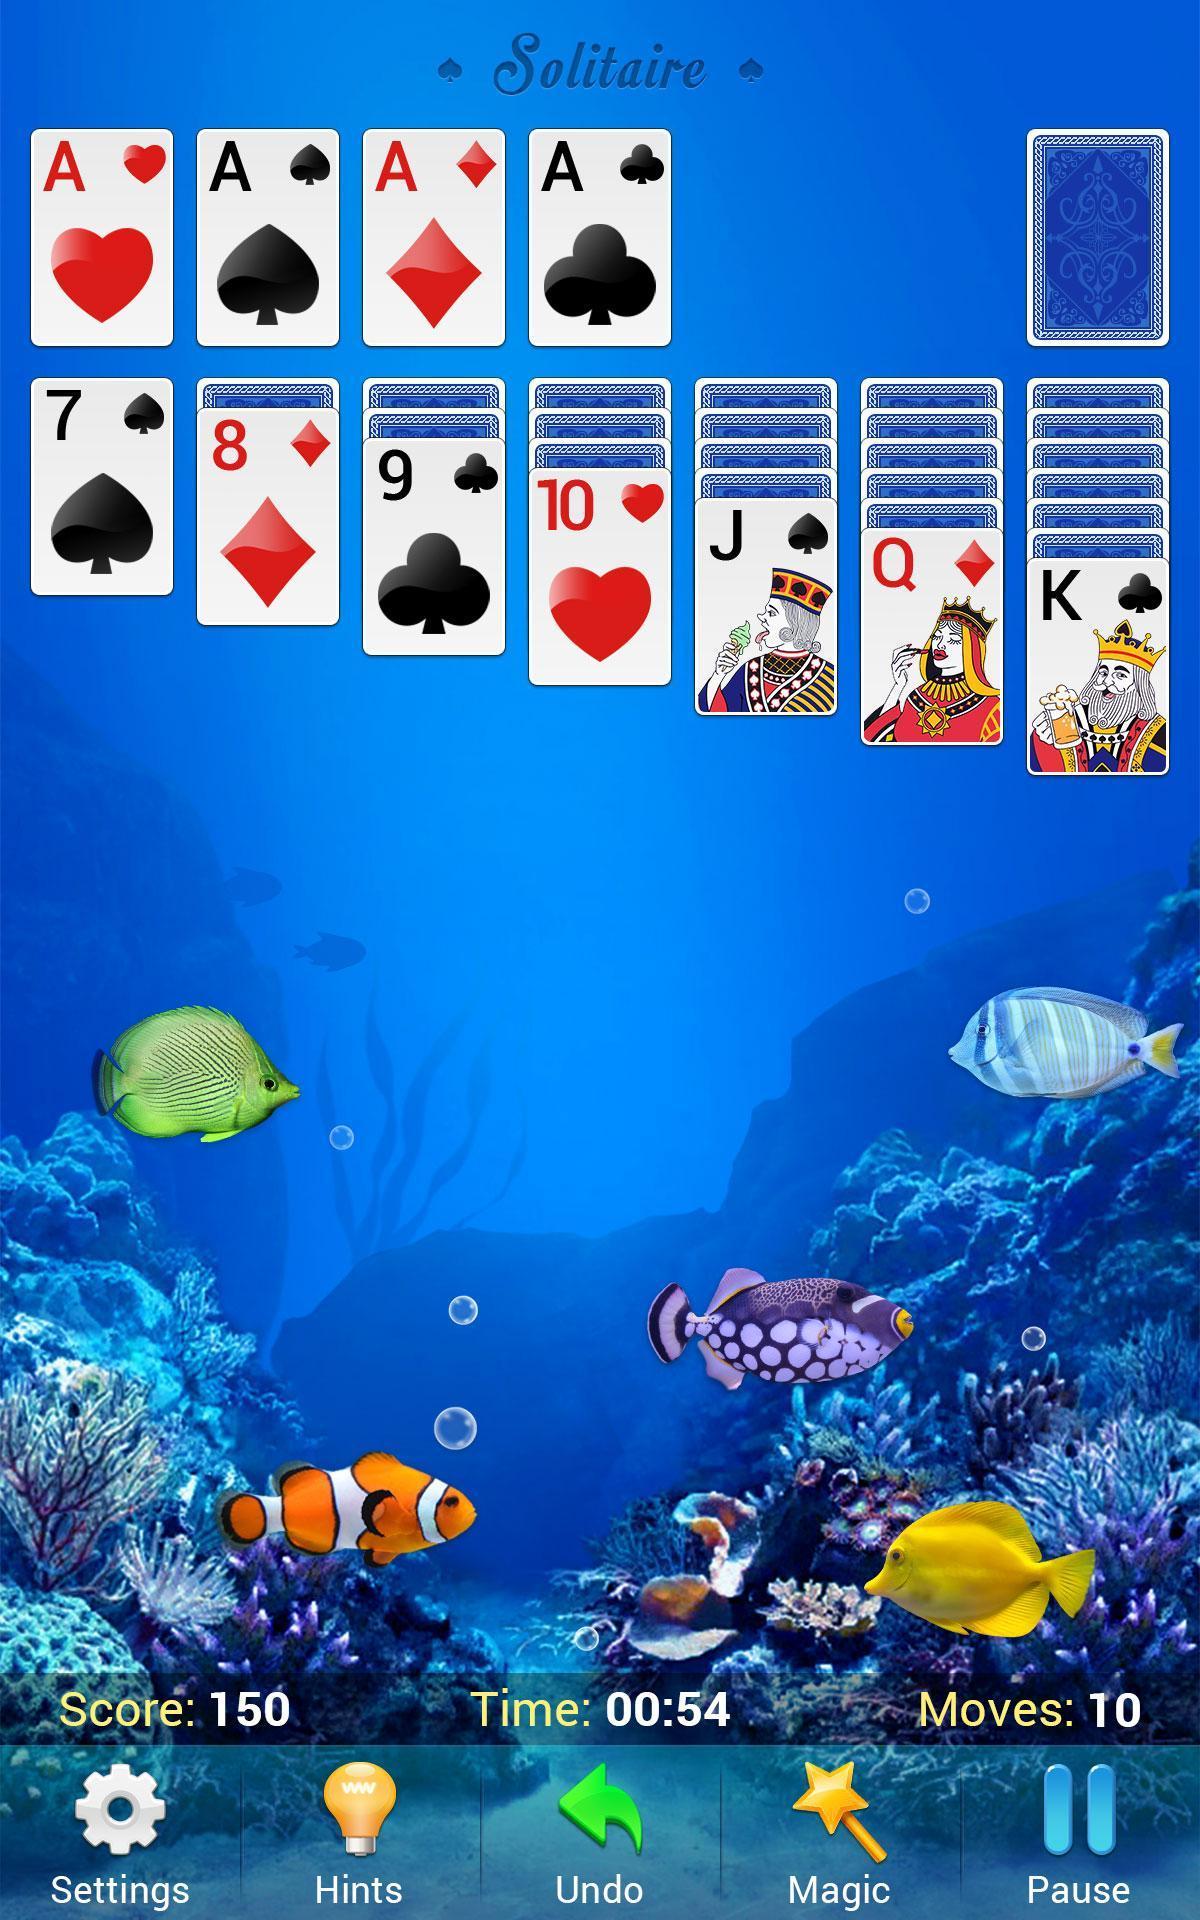 Solitaire Classic Klondike Solitaire Card Game 1.0.27 Screenshot 10